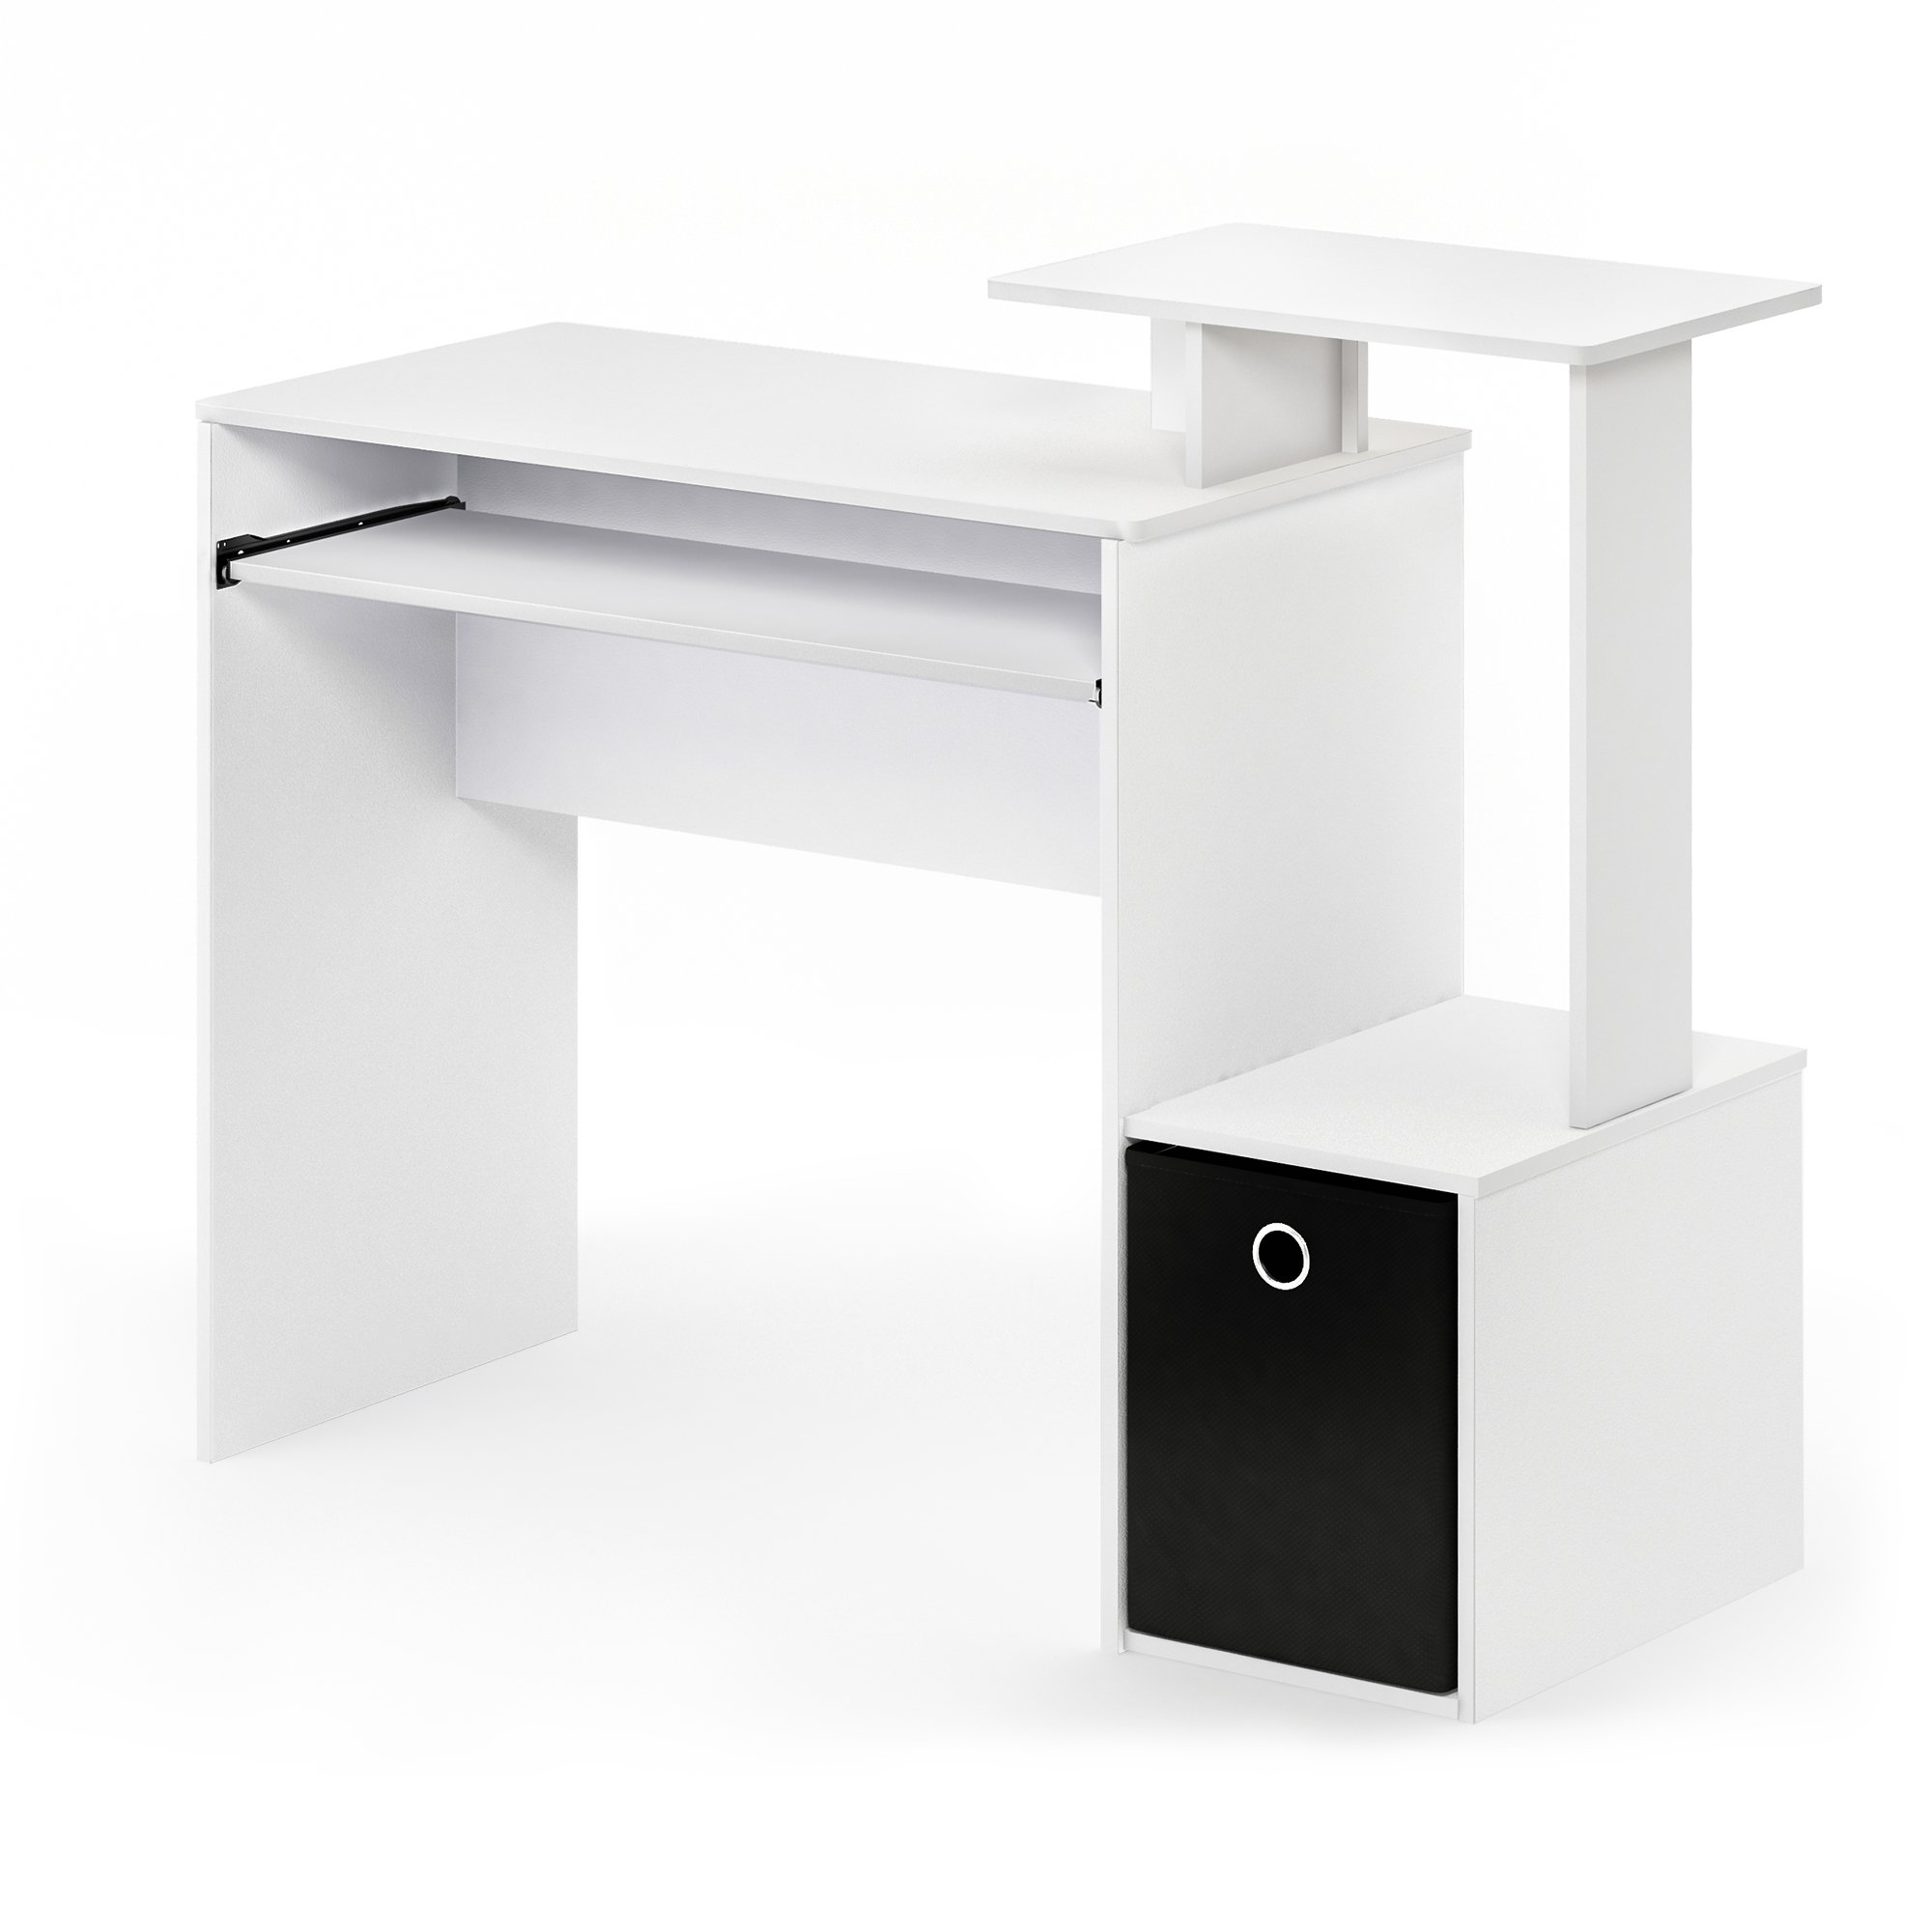 FURINNO 12095WH/BK Econ Home Computer Desk with Shelves, White/Black